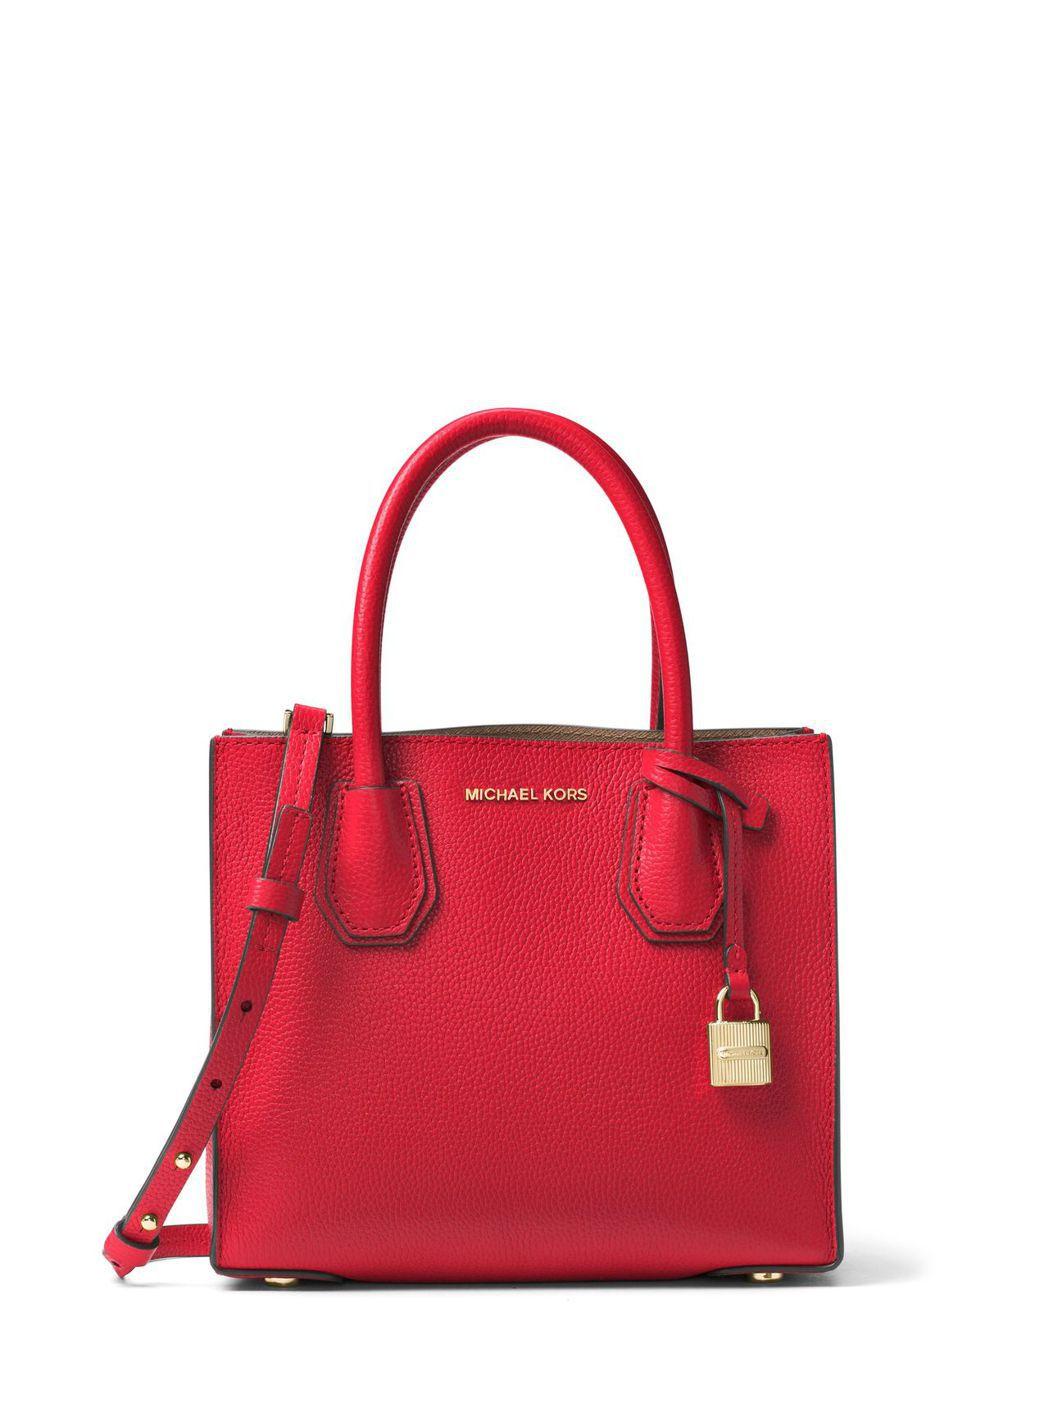 Mercer鮮紅色小方包,售價12,400元。圖/MICHAEL KORS提供